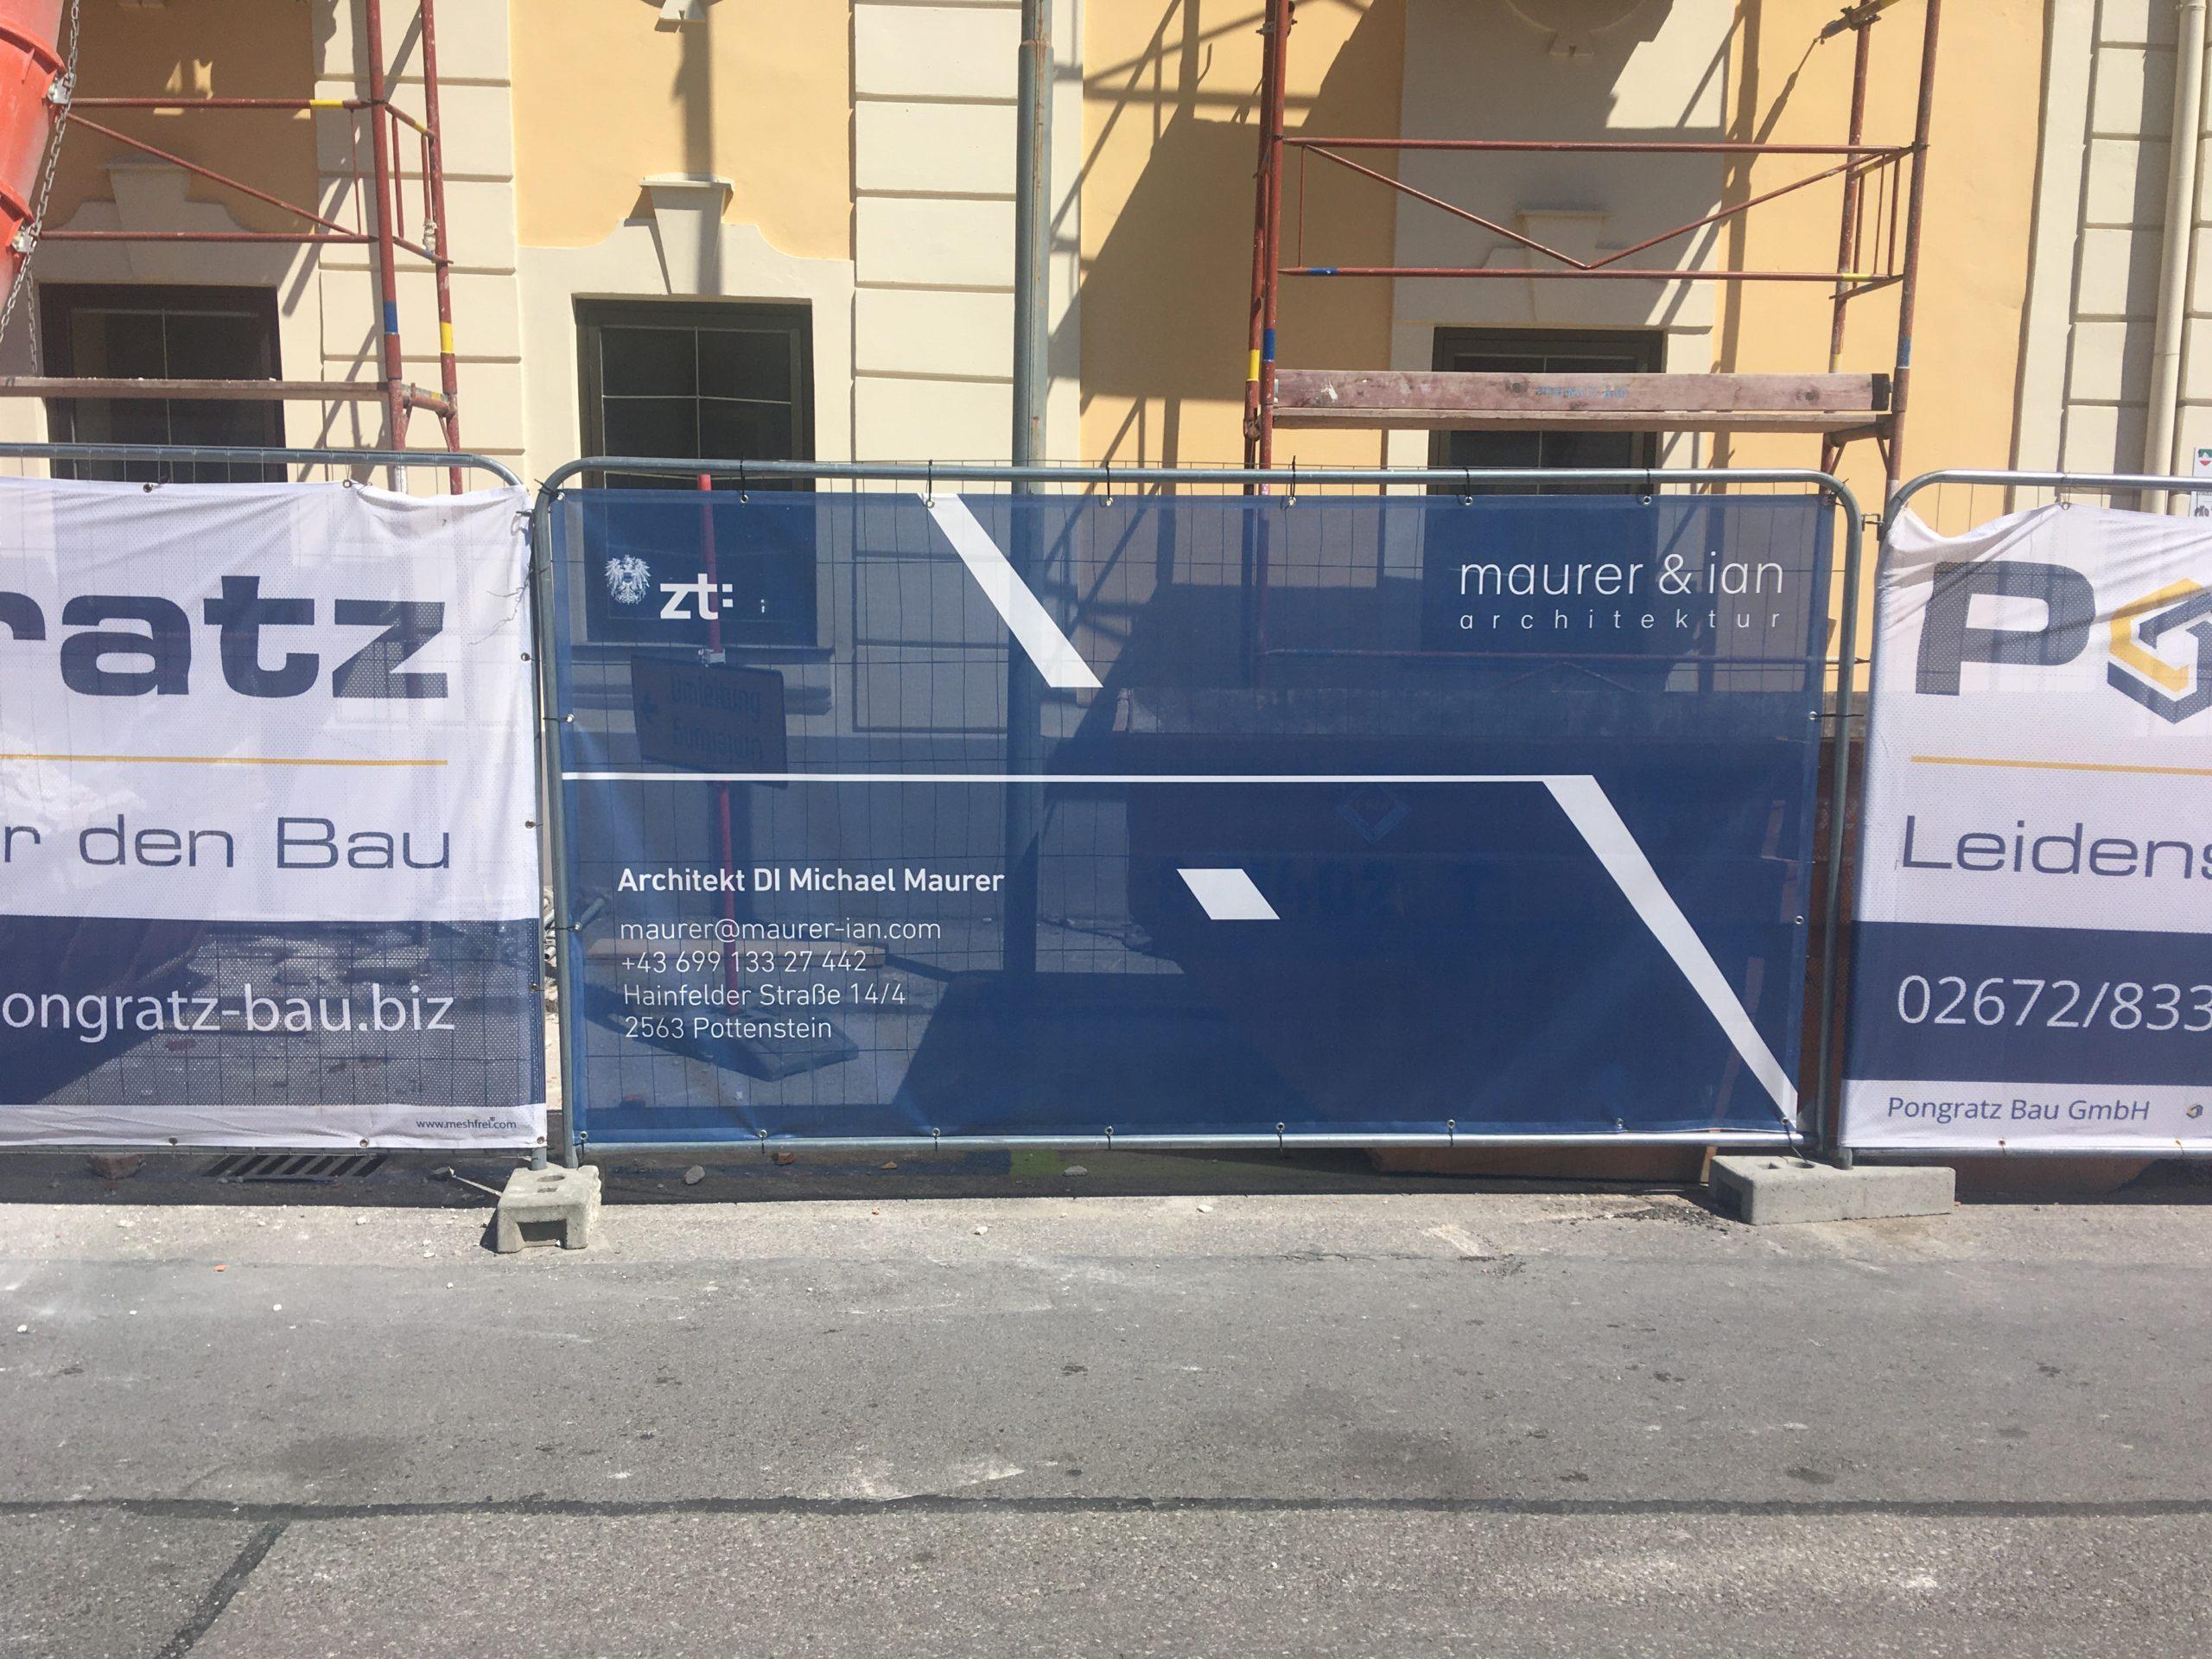 Bauzaunblende_Architekt_DI_Michael_Maurer2